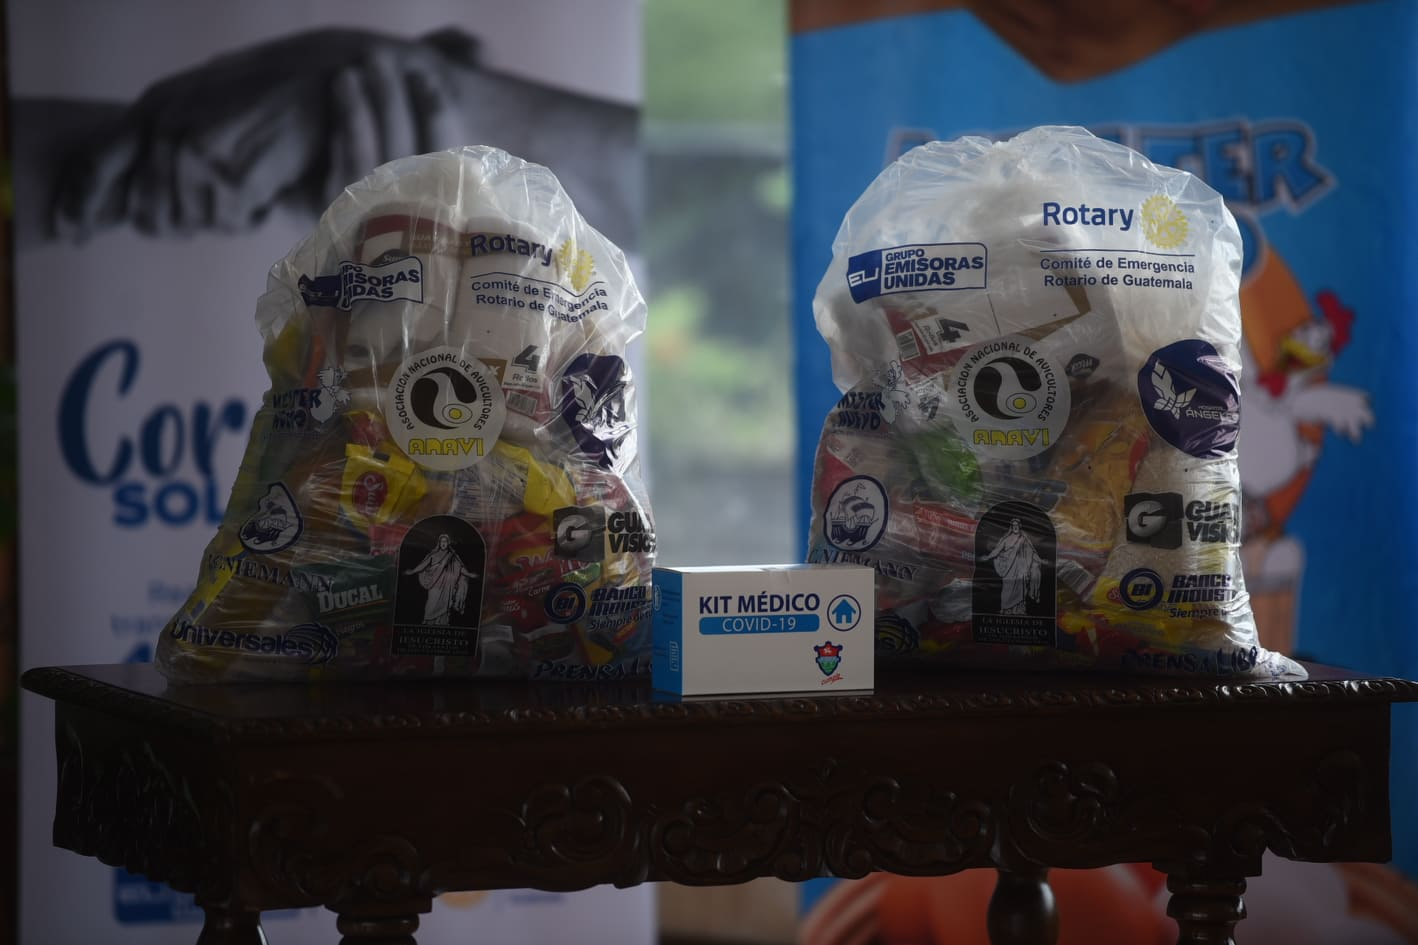 campaña Corazones Solidarios entrega alimentos a afectados por Covid-19